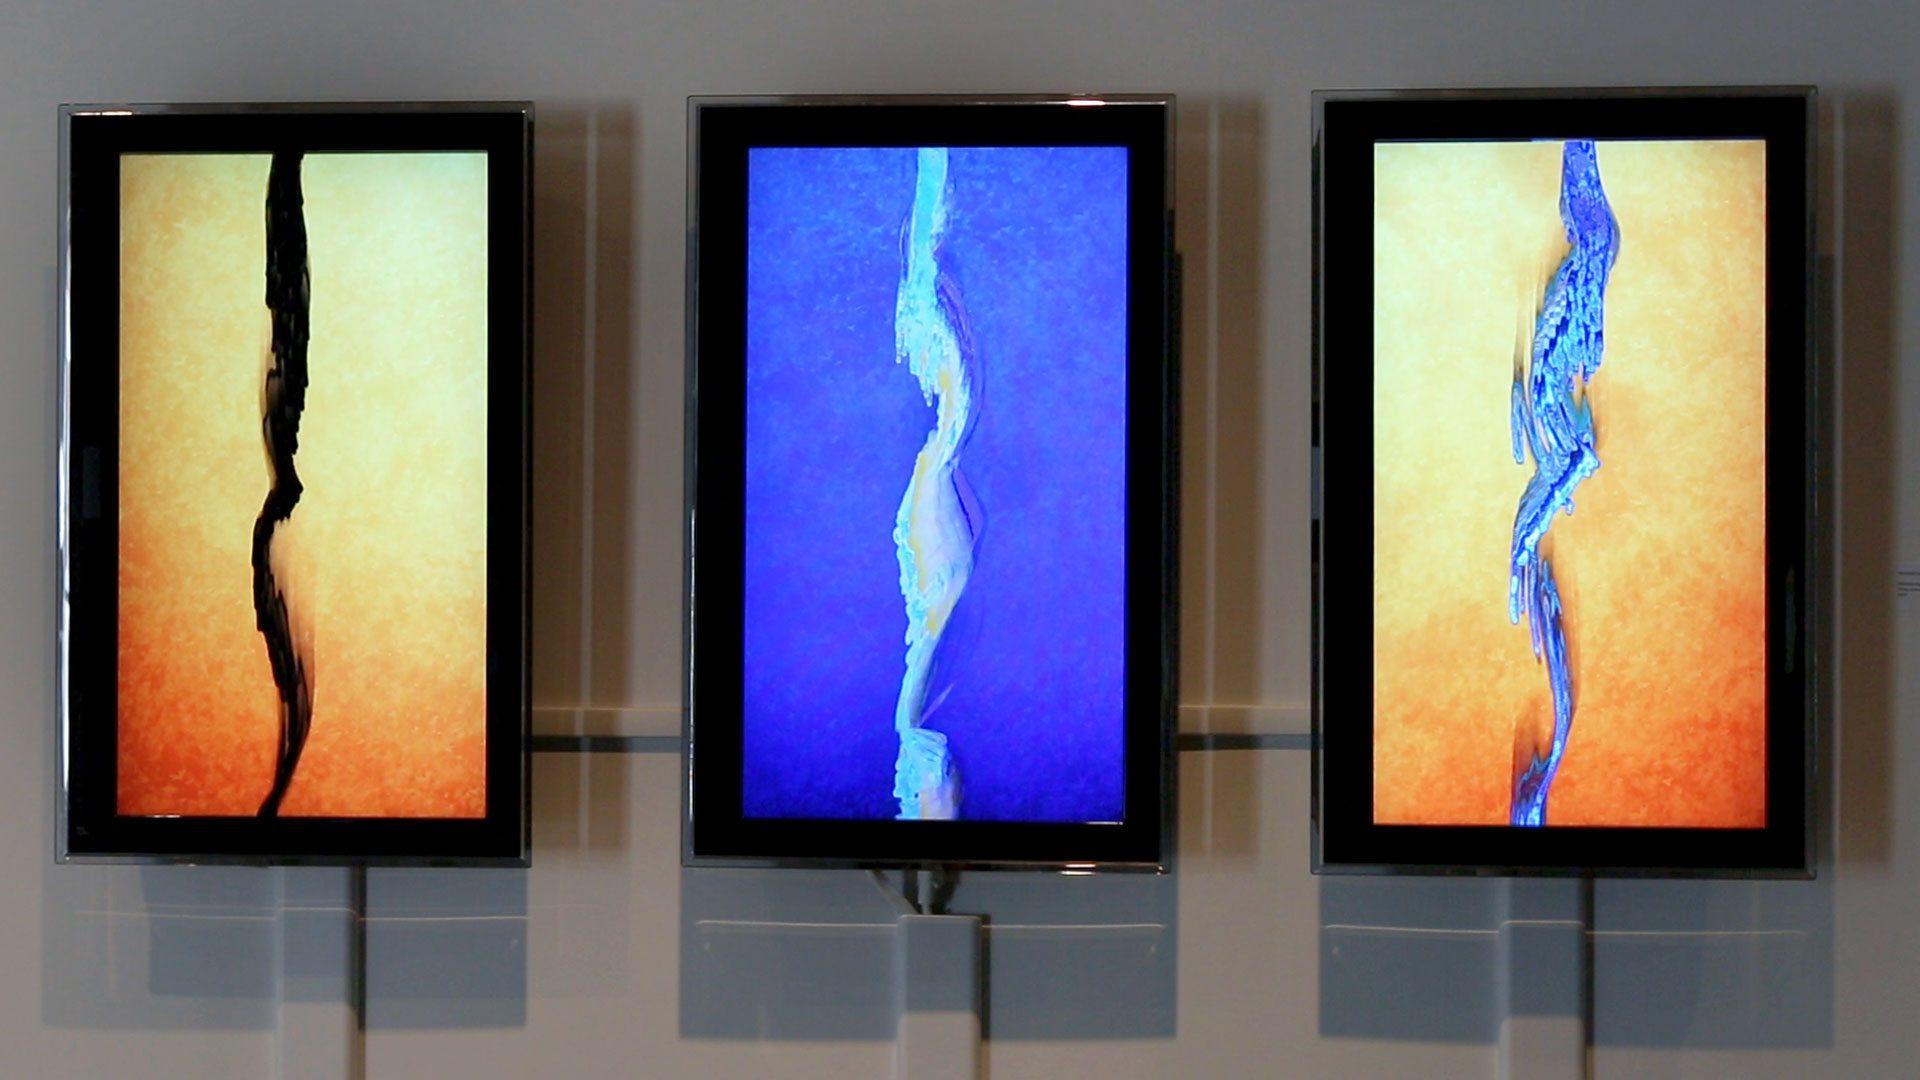 Michelle Higa Fox – Waterfall Studies